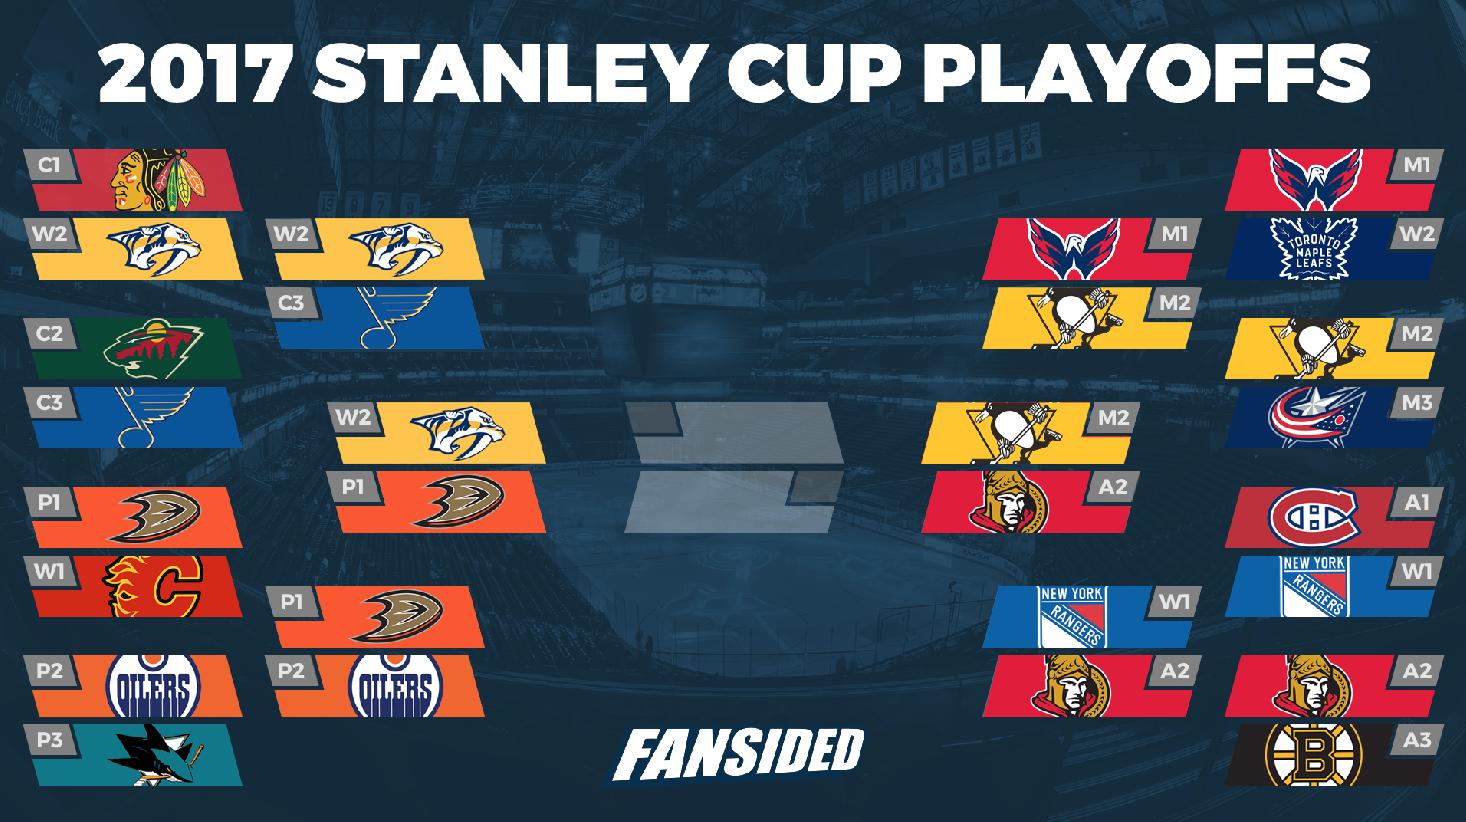 2017 Stanley Cup Playoffs Bracket Conference Finals